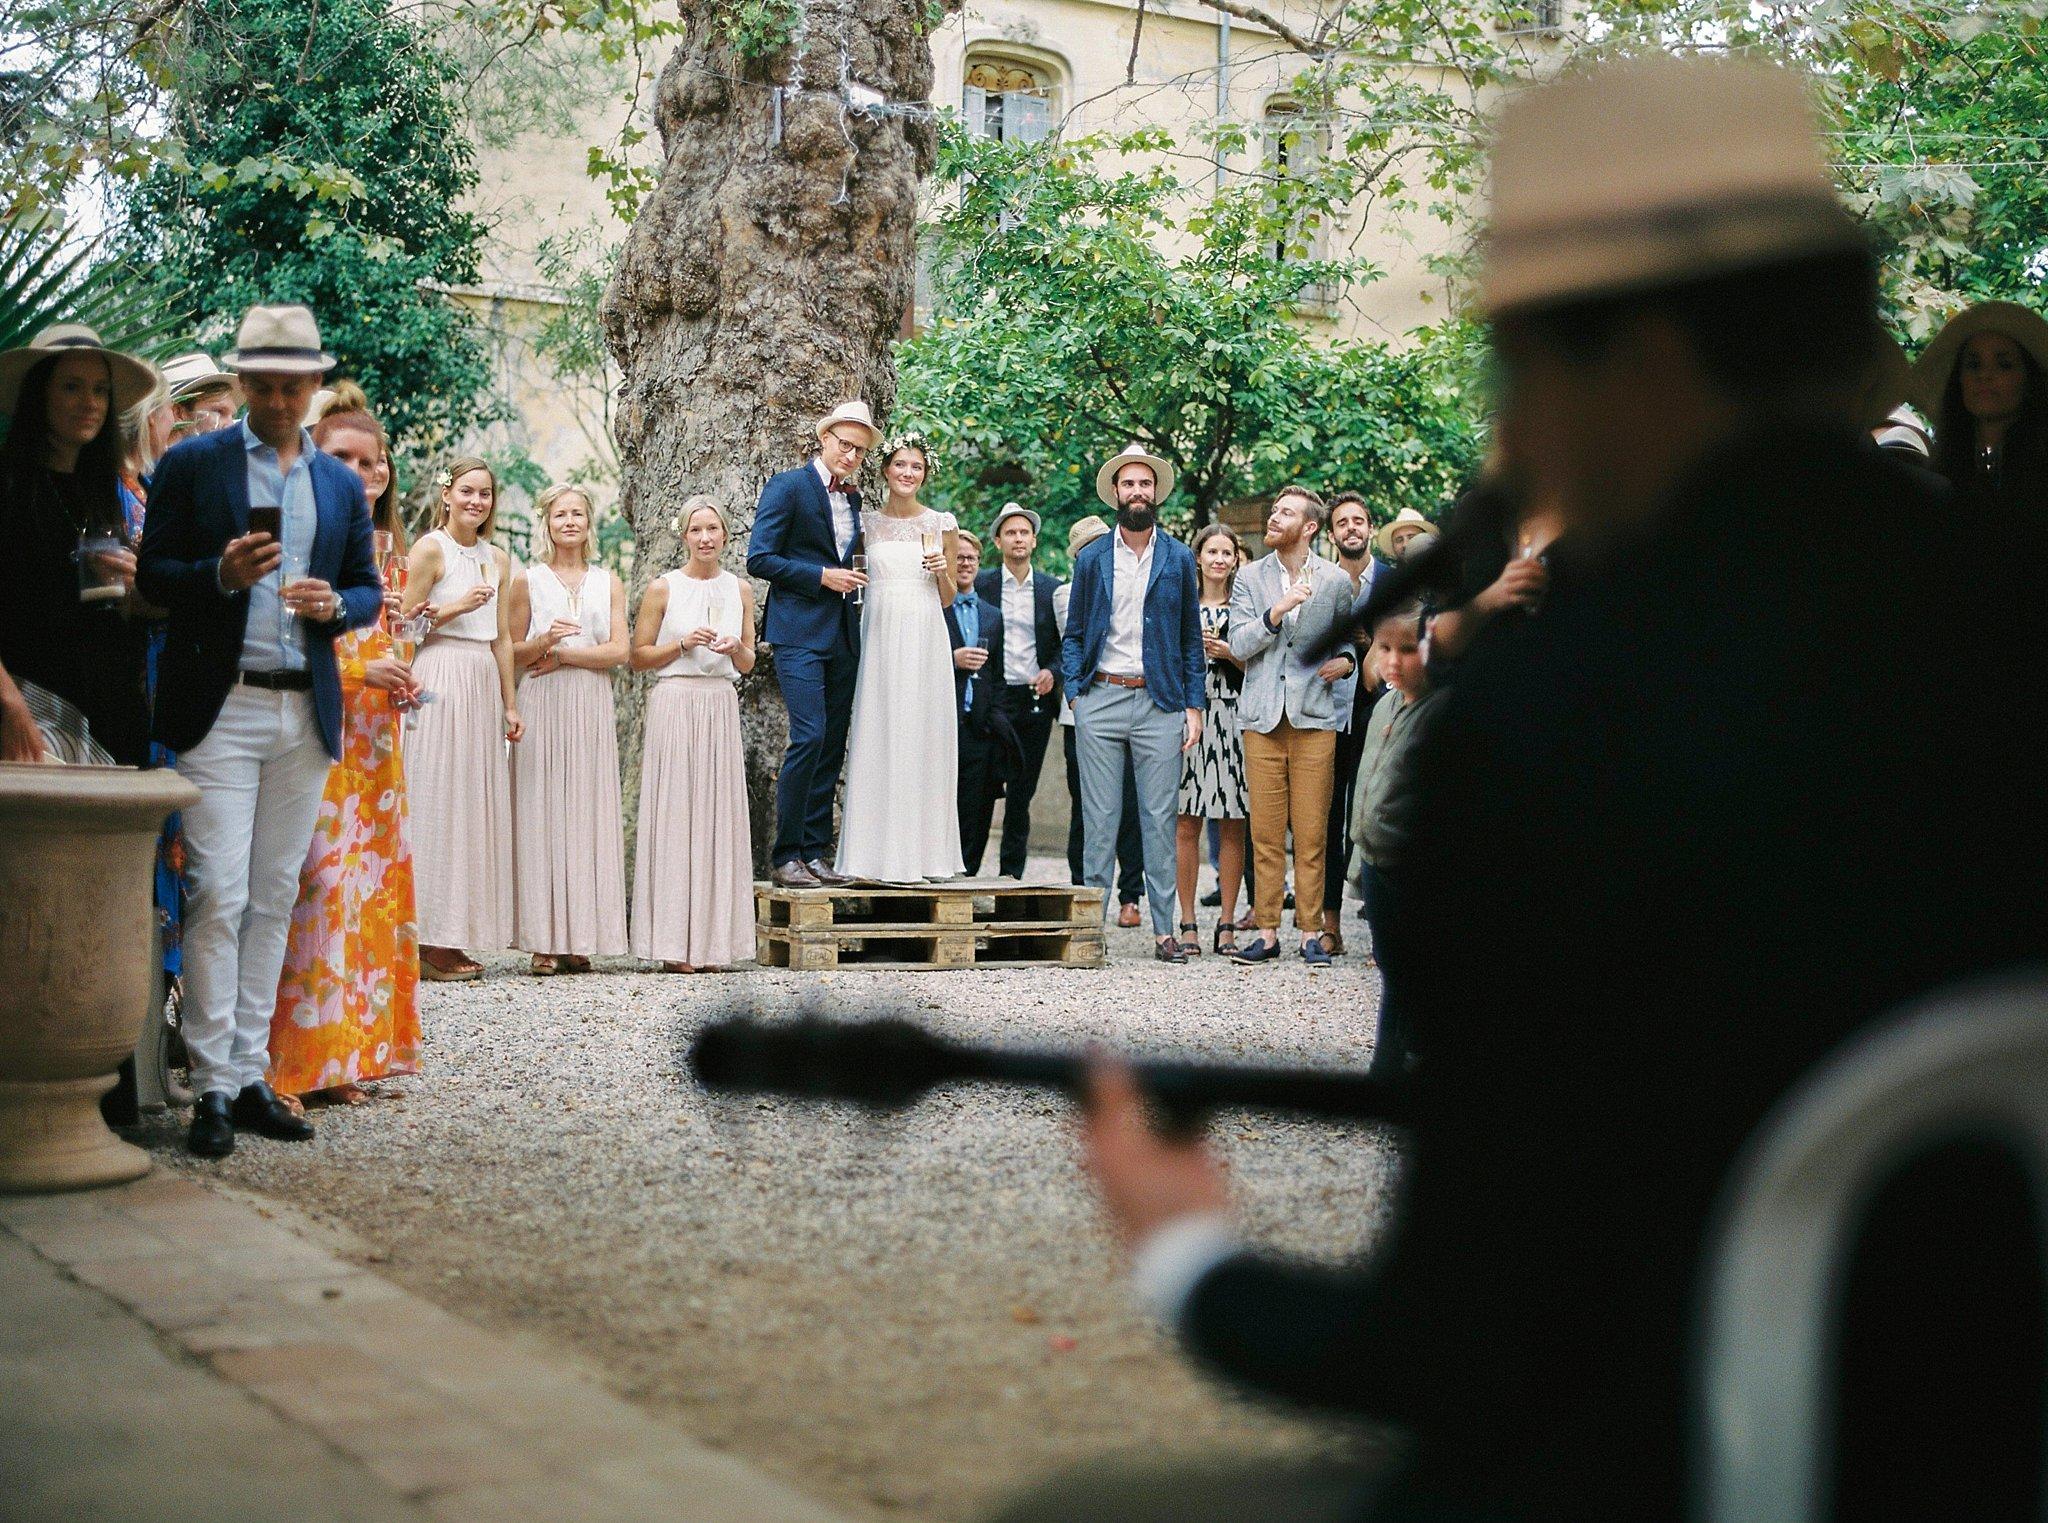 Wedding Photographer Perpignan - Château Las Collas Wedding - Hugo Hennequin035.jpg